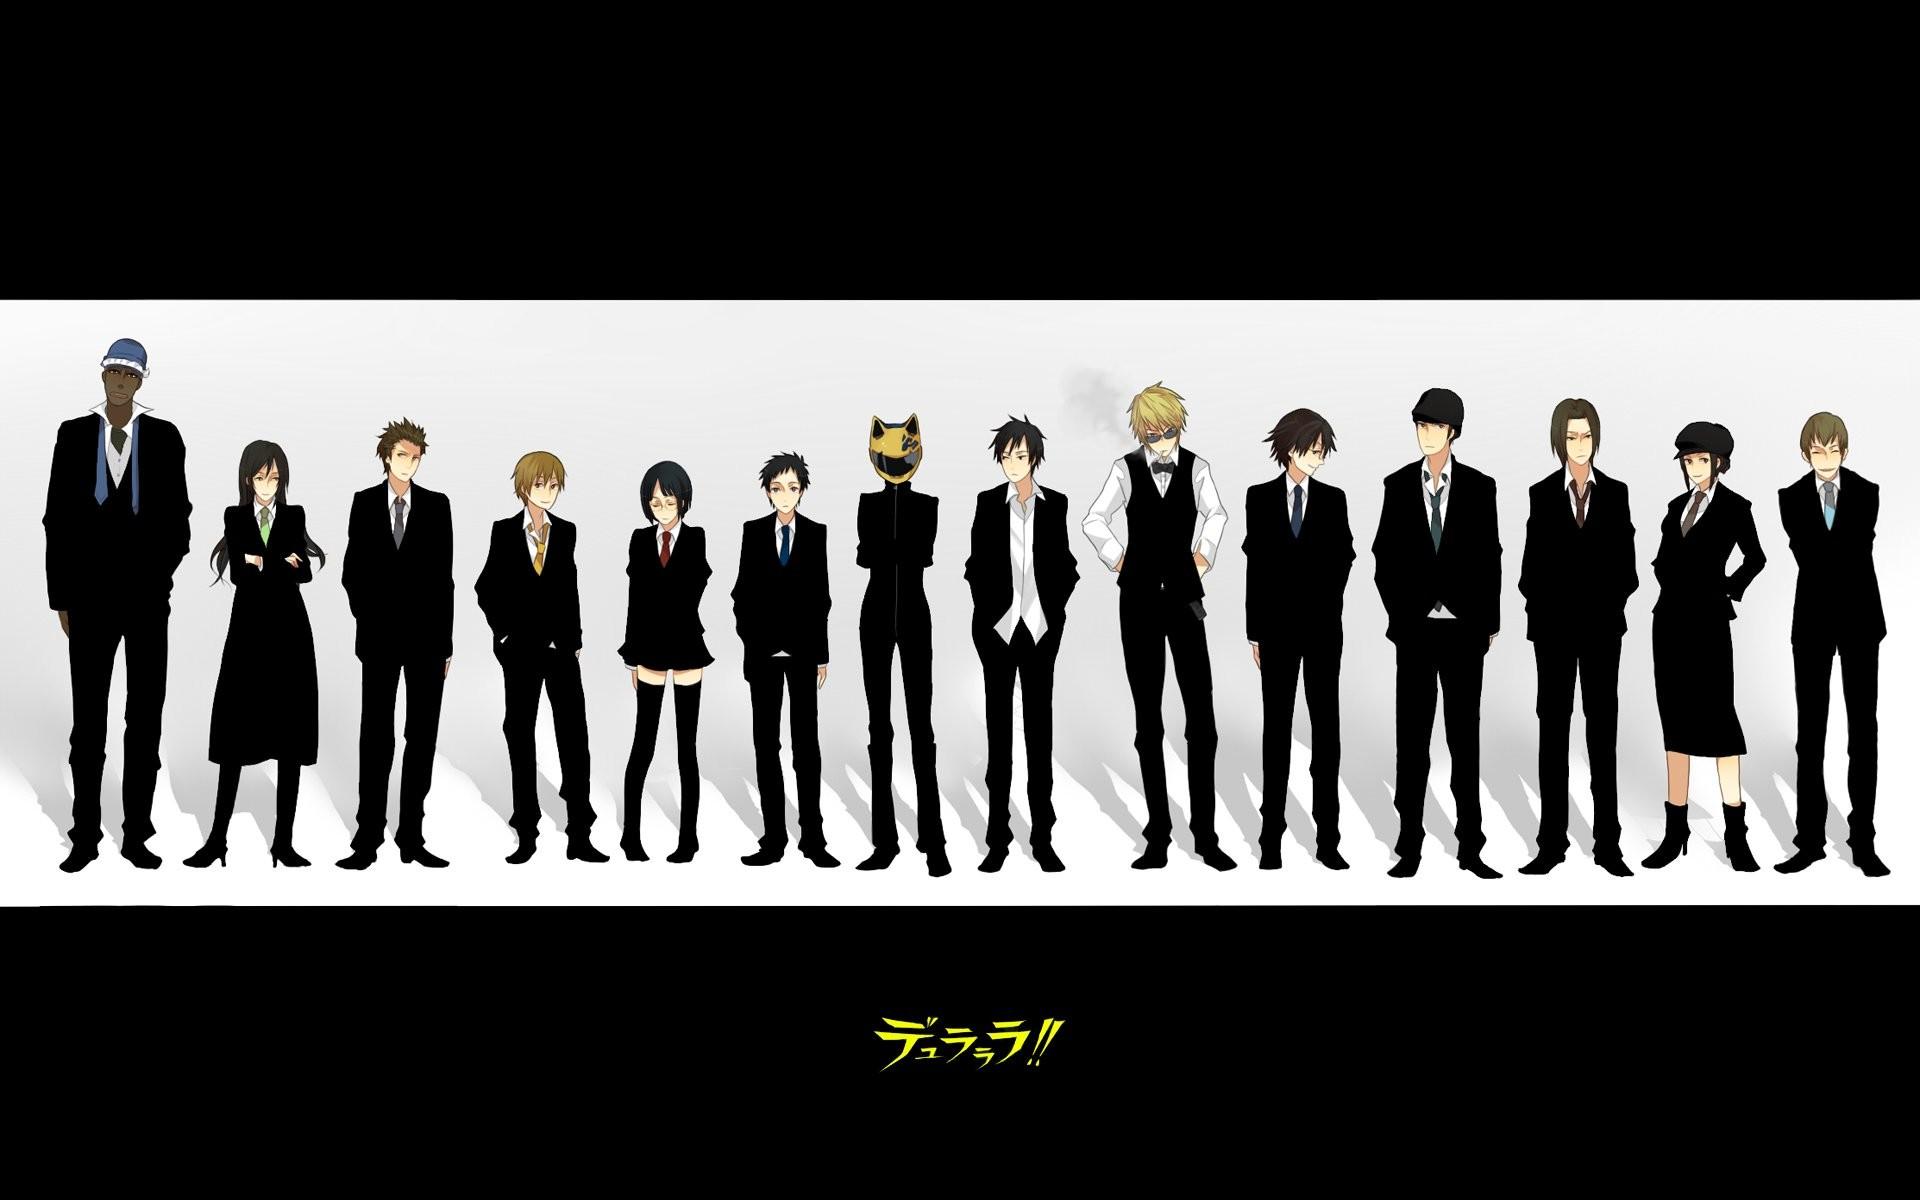 Anime girl Gangsta anime series group character guy wallpaper | |  848576 | WallpaperUP